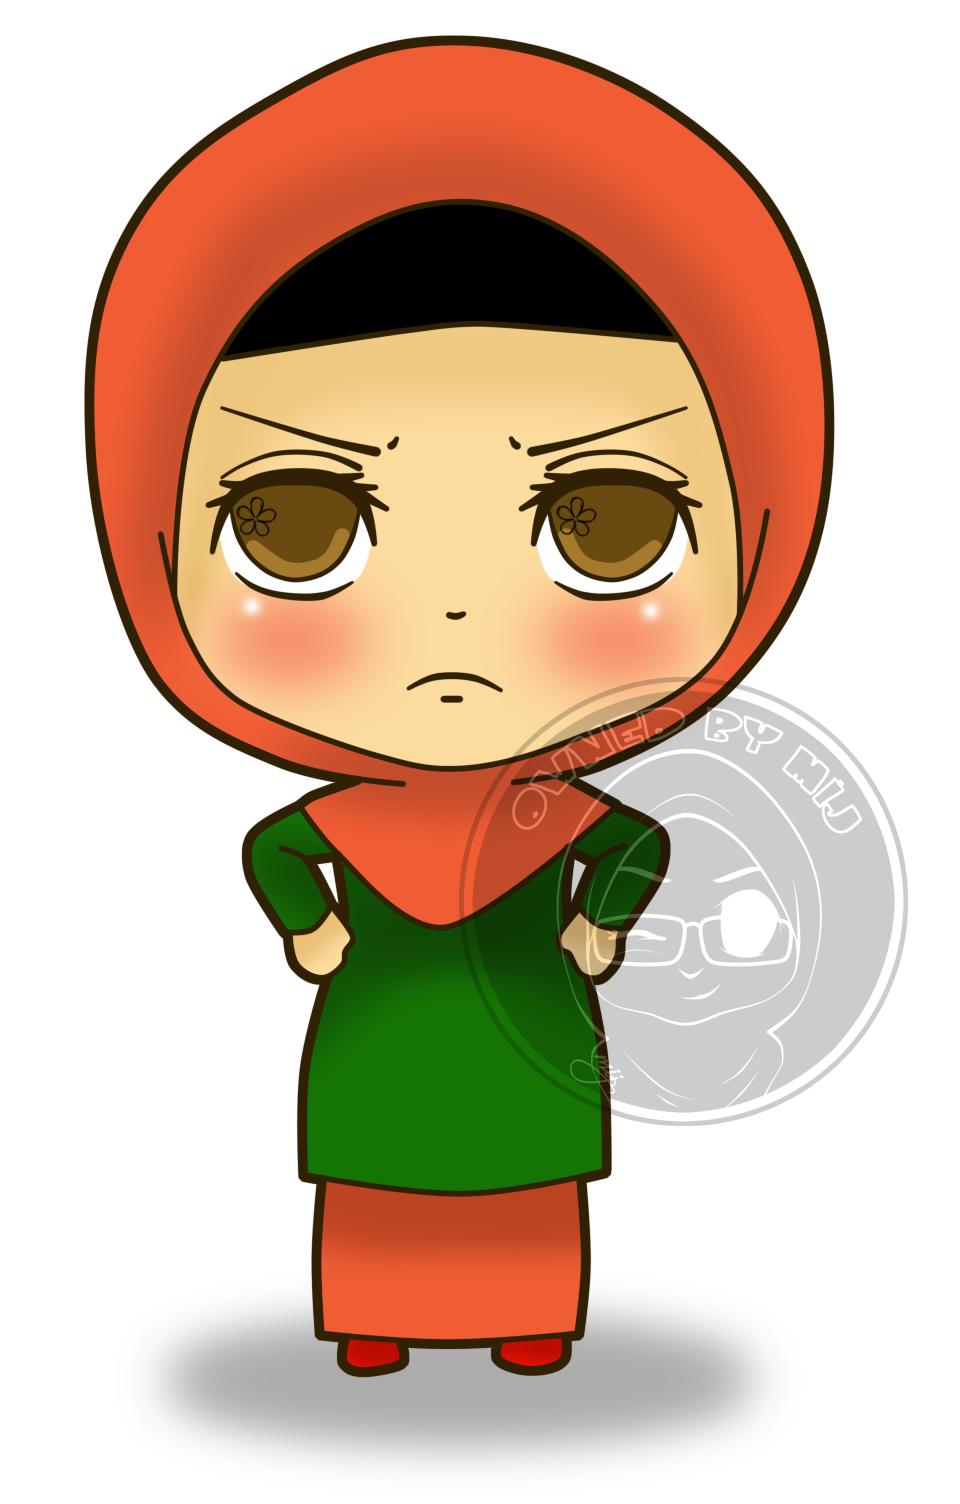 Gambar Kartun Muslimah Marah Gambar Kartun